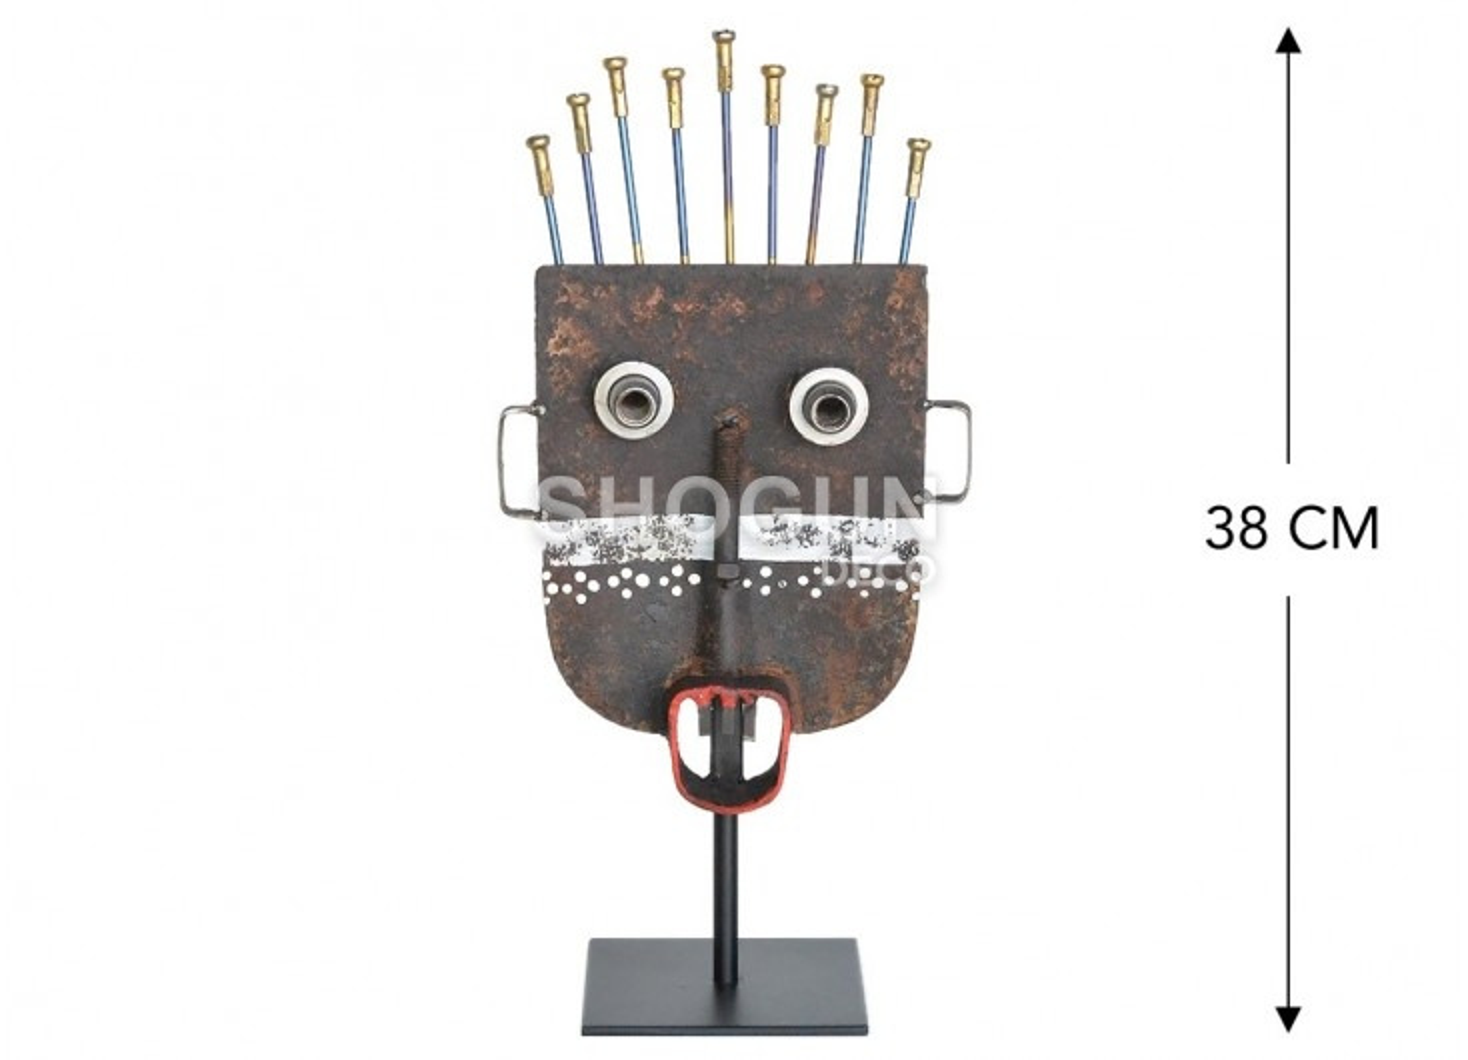 Masque décoratif en métal recyclé - S7